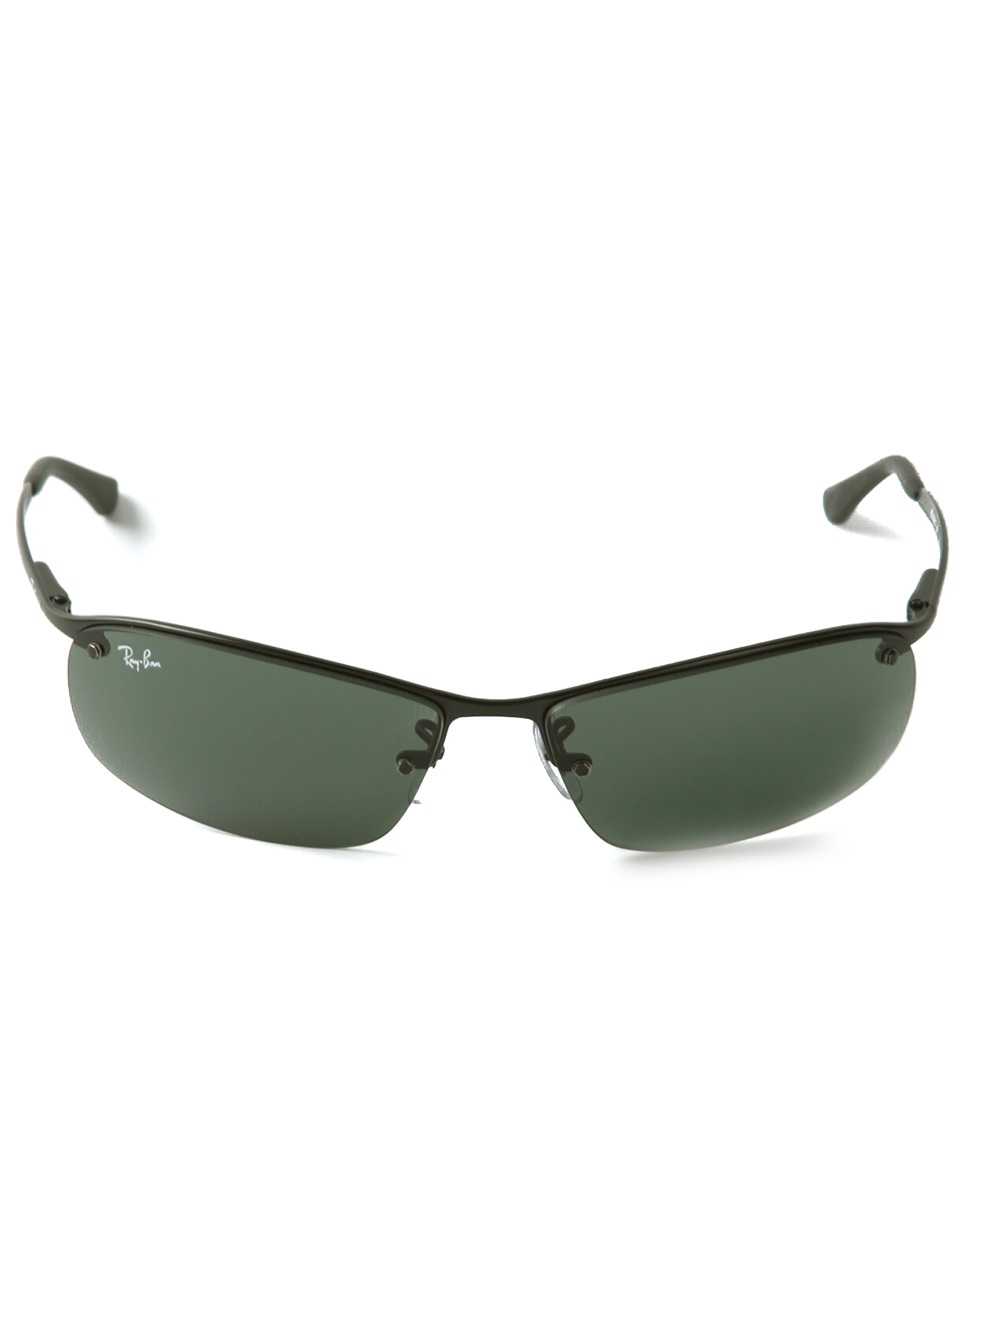 a90ad3e4f1 Gallery. Previously sold at  Farfetch · Men s Round Sunglasses Men s Ray Ban  ...